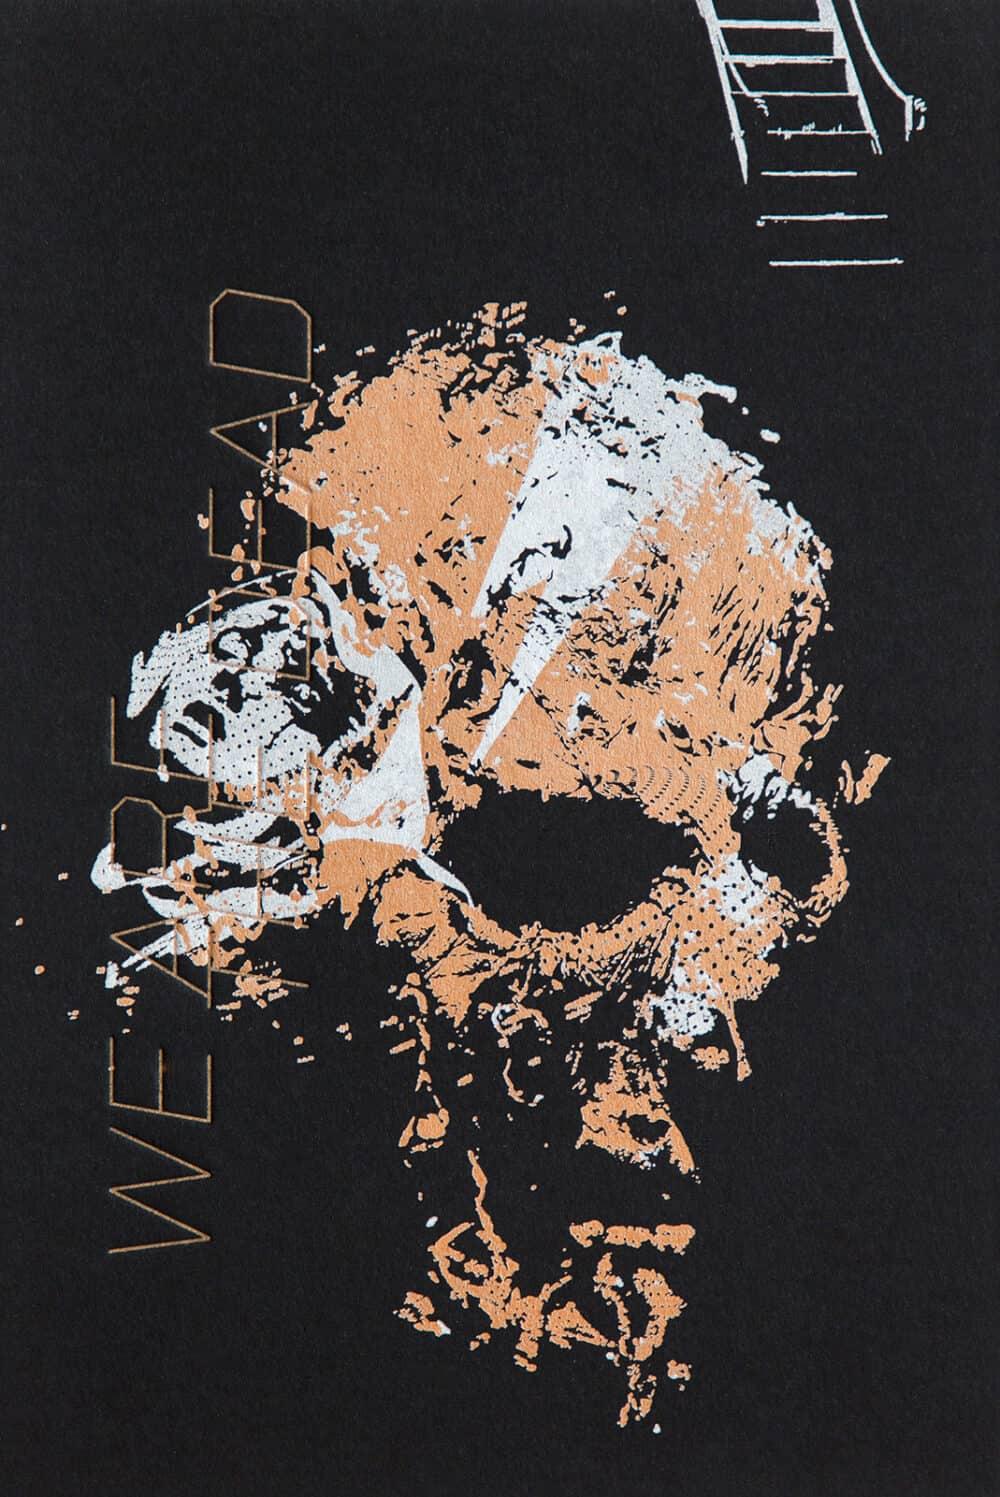 WE ARE THE DEAD - Letterpress Art Print